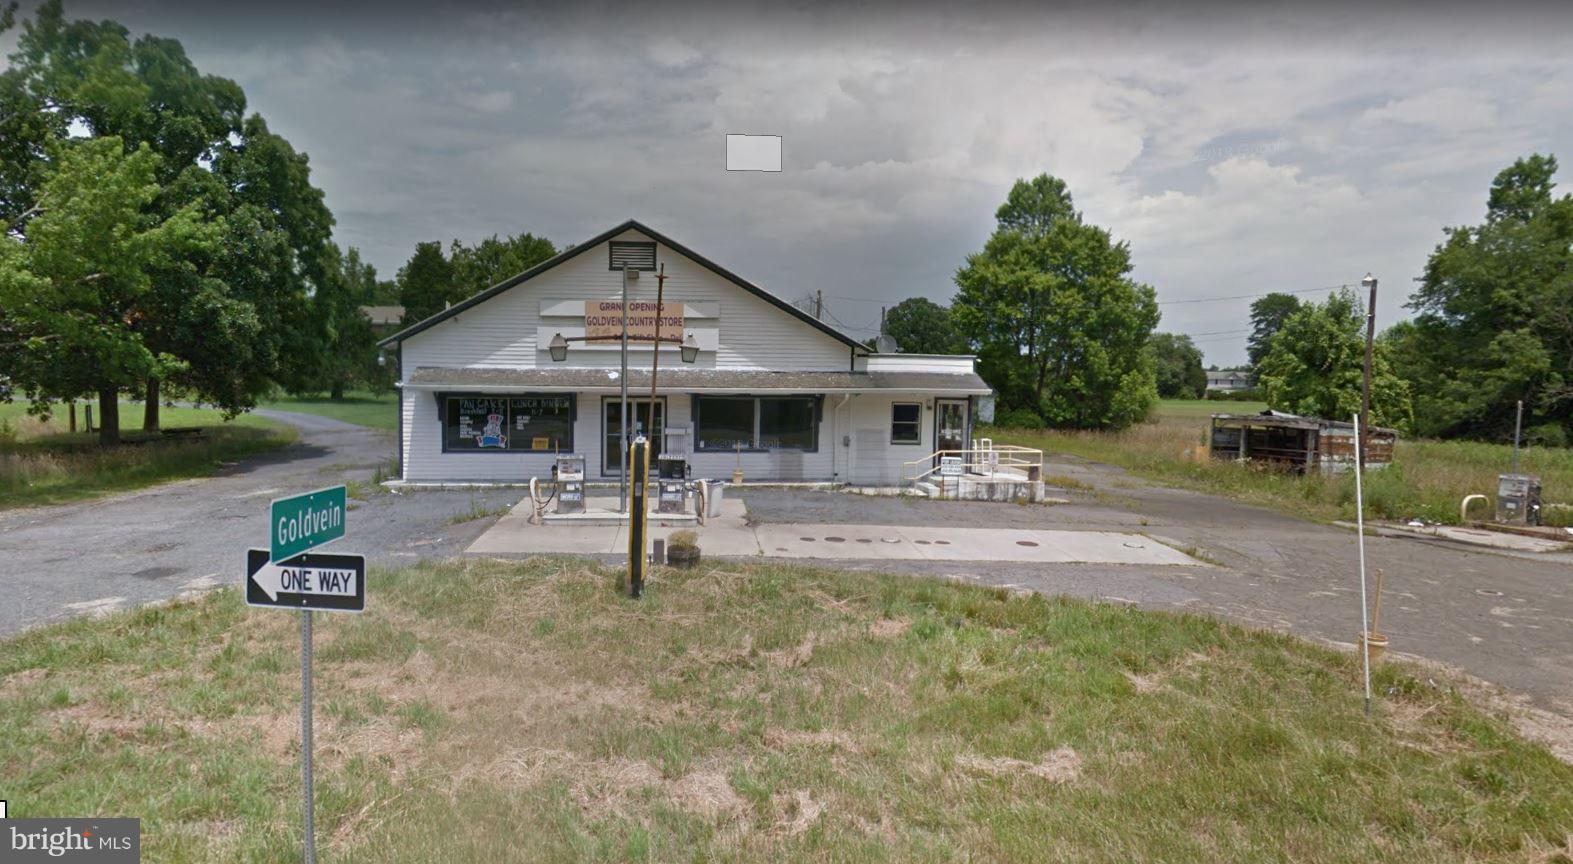 14289 WARRENTON RD, GOLDVEIN, VA 22720